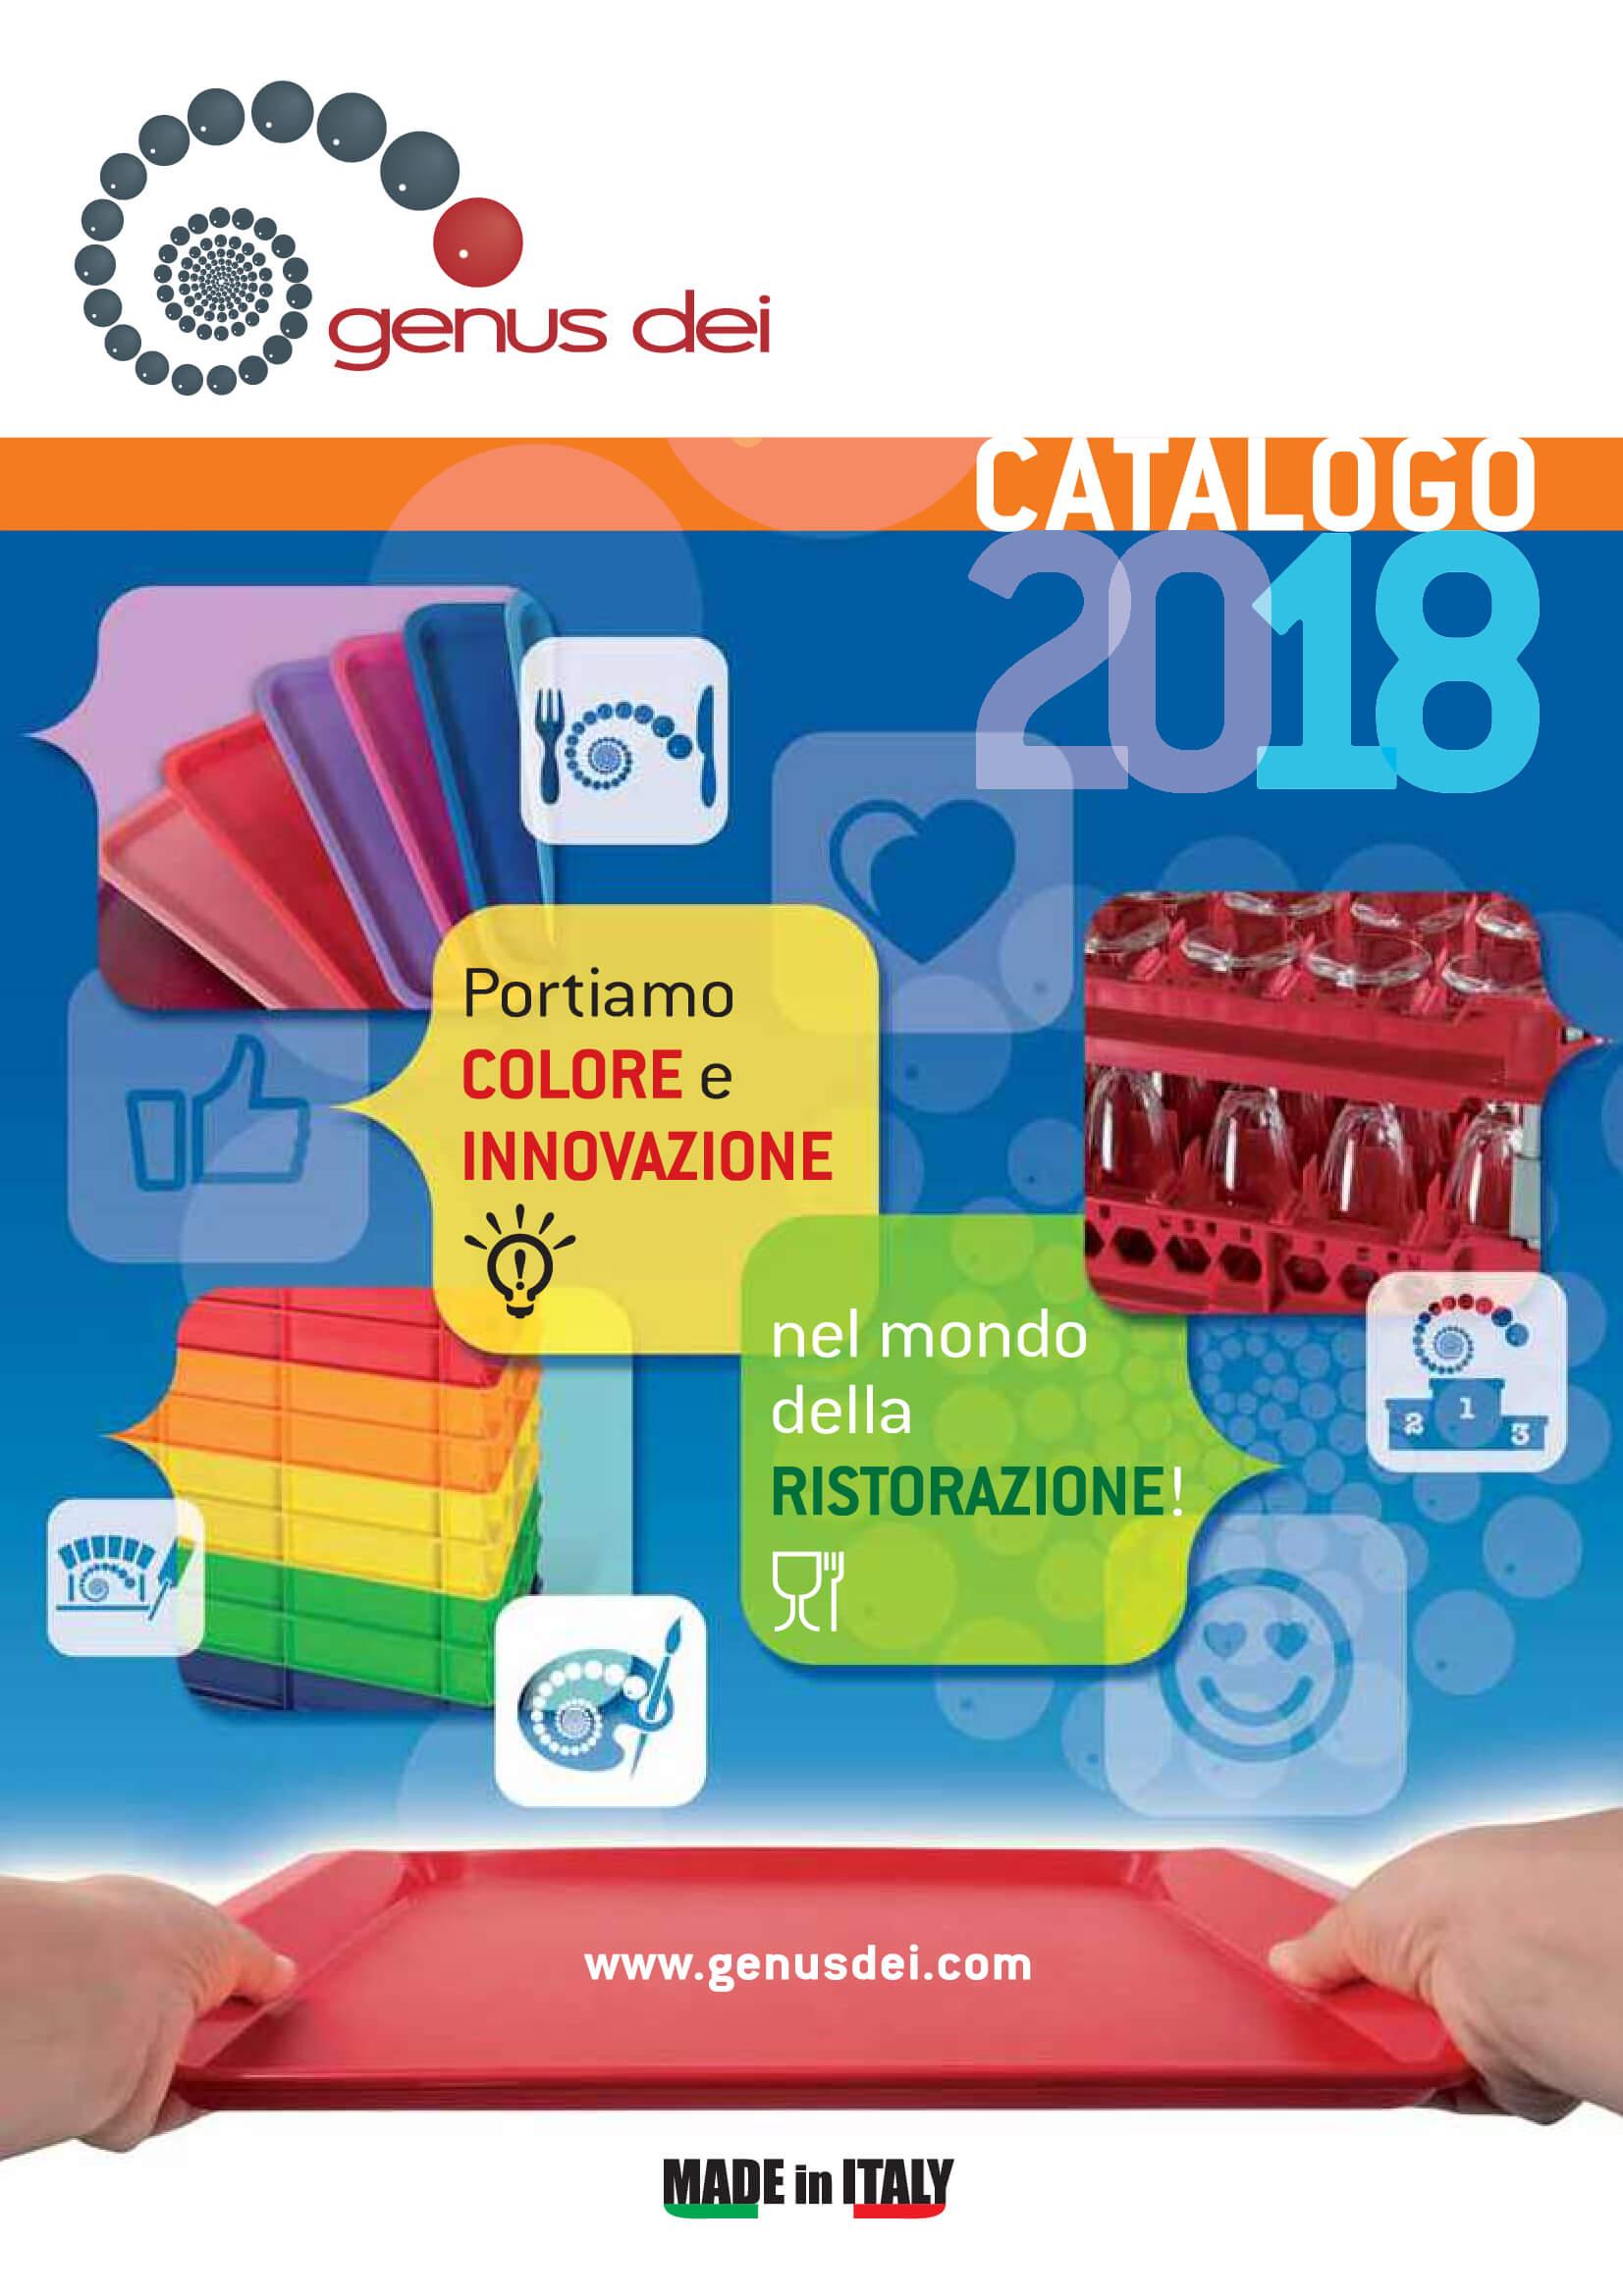 Catalogo 2018 Genus Dei